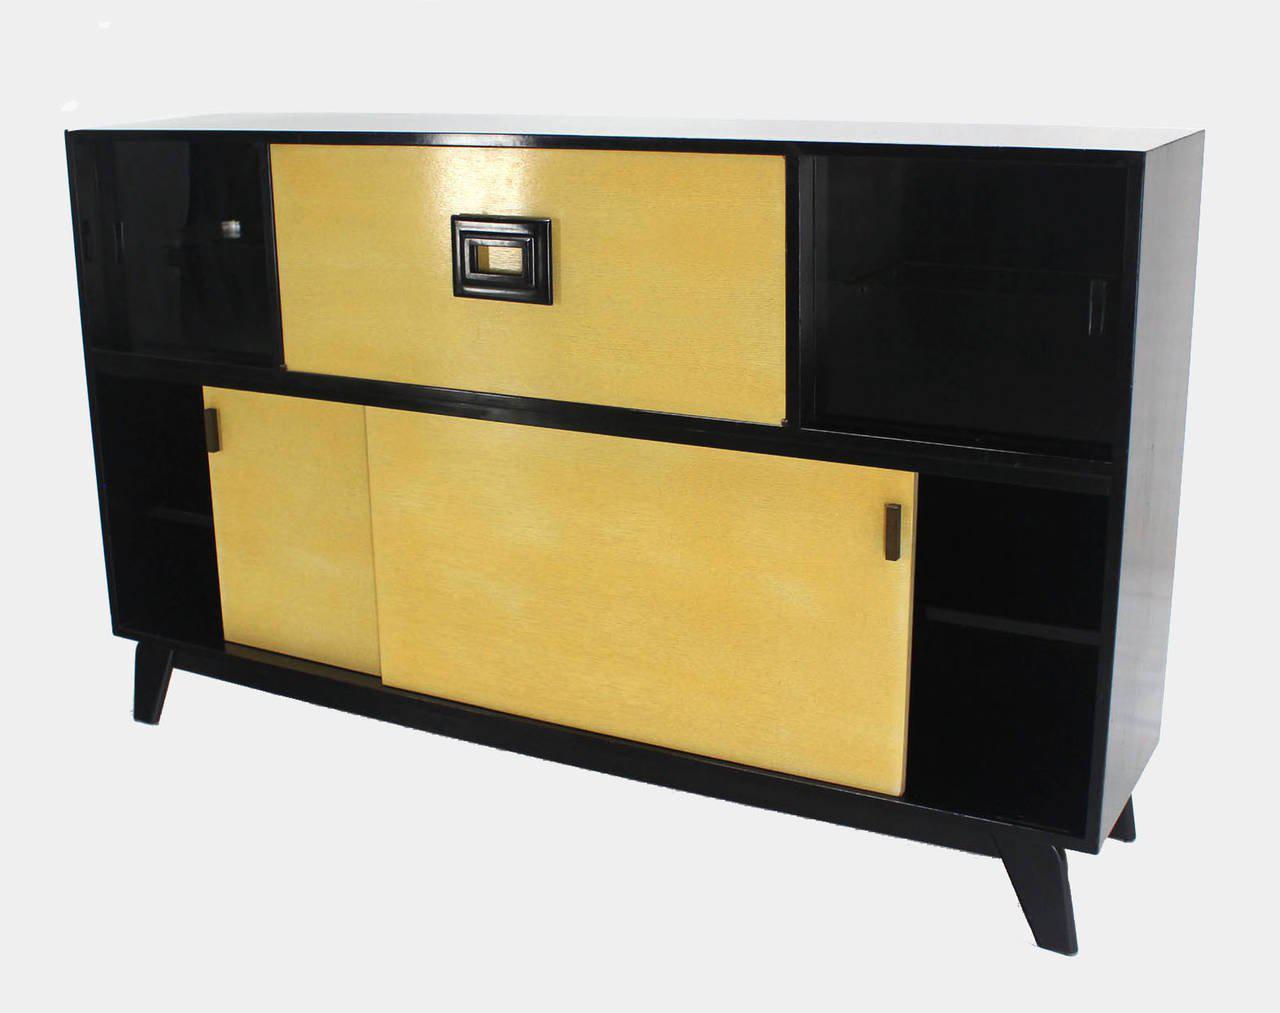 midcentury modern credenza black lacquer gredenza bar liquor cabinet image 5 of 8